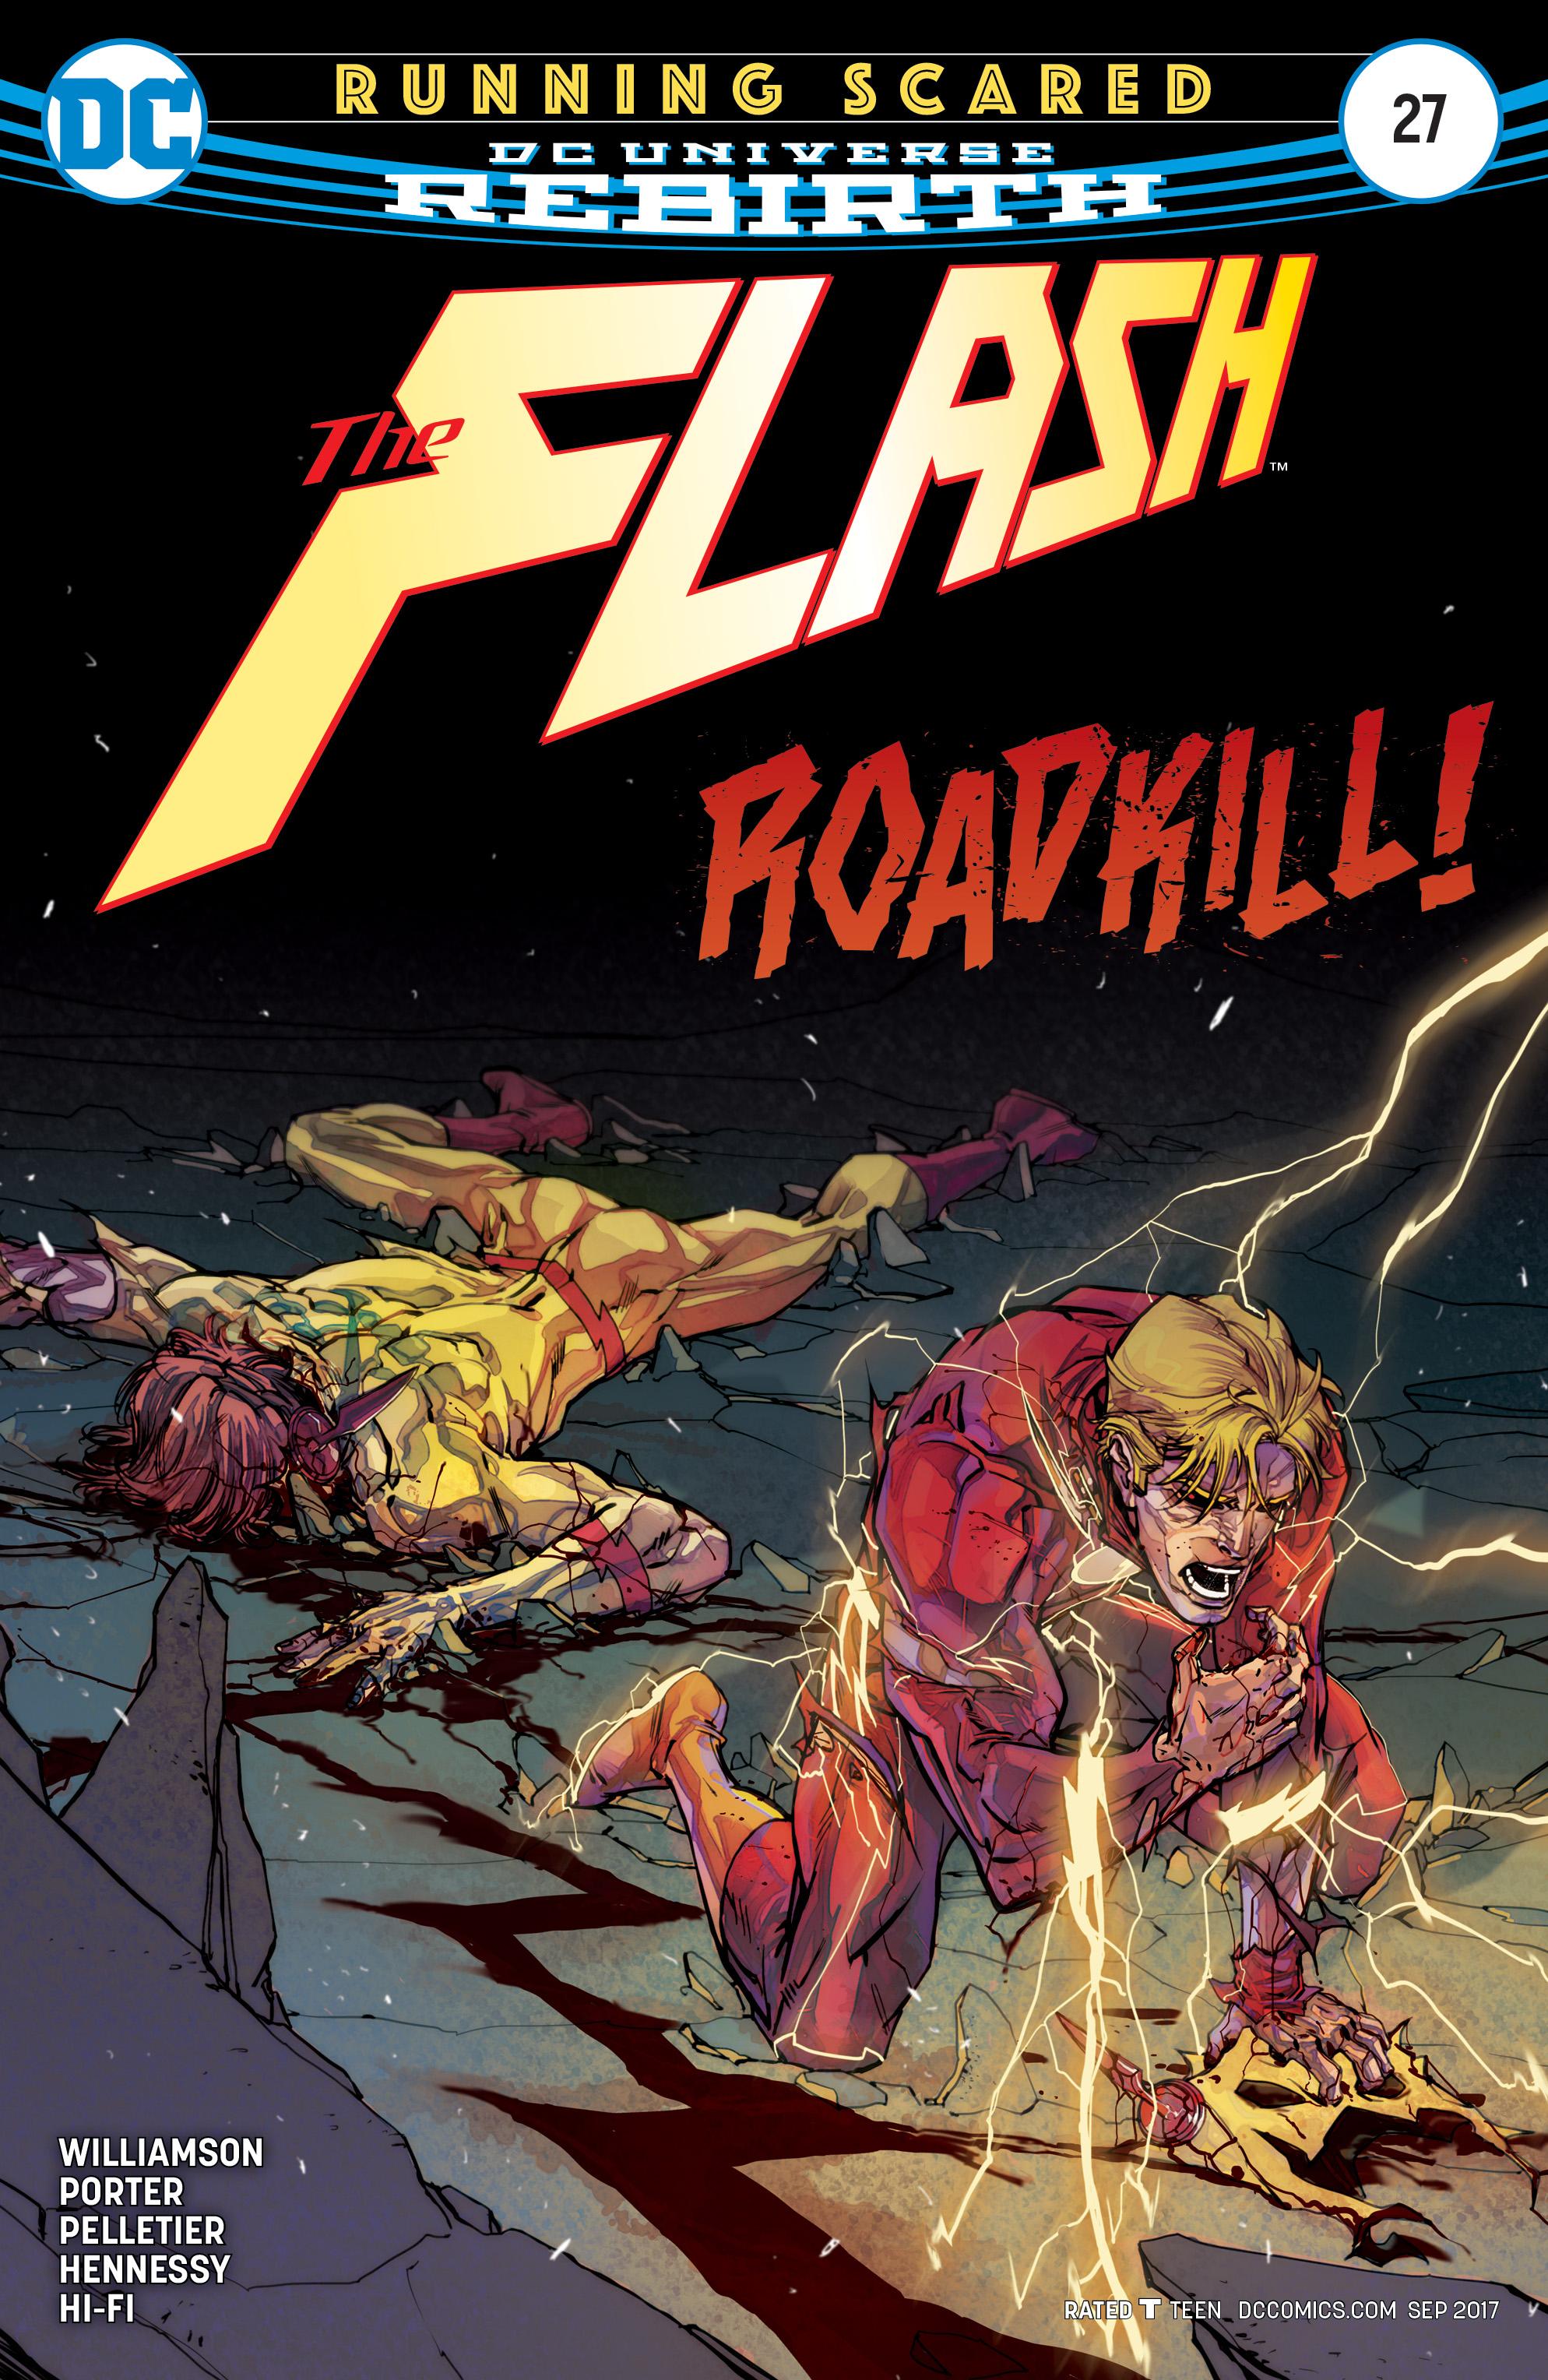 The Flash #27